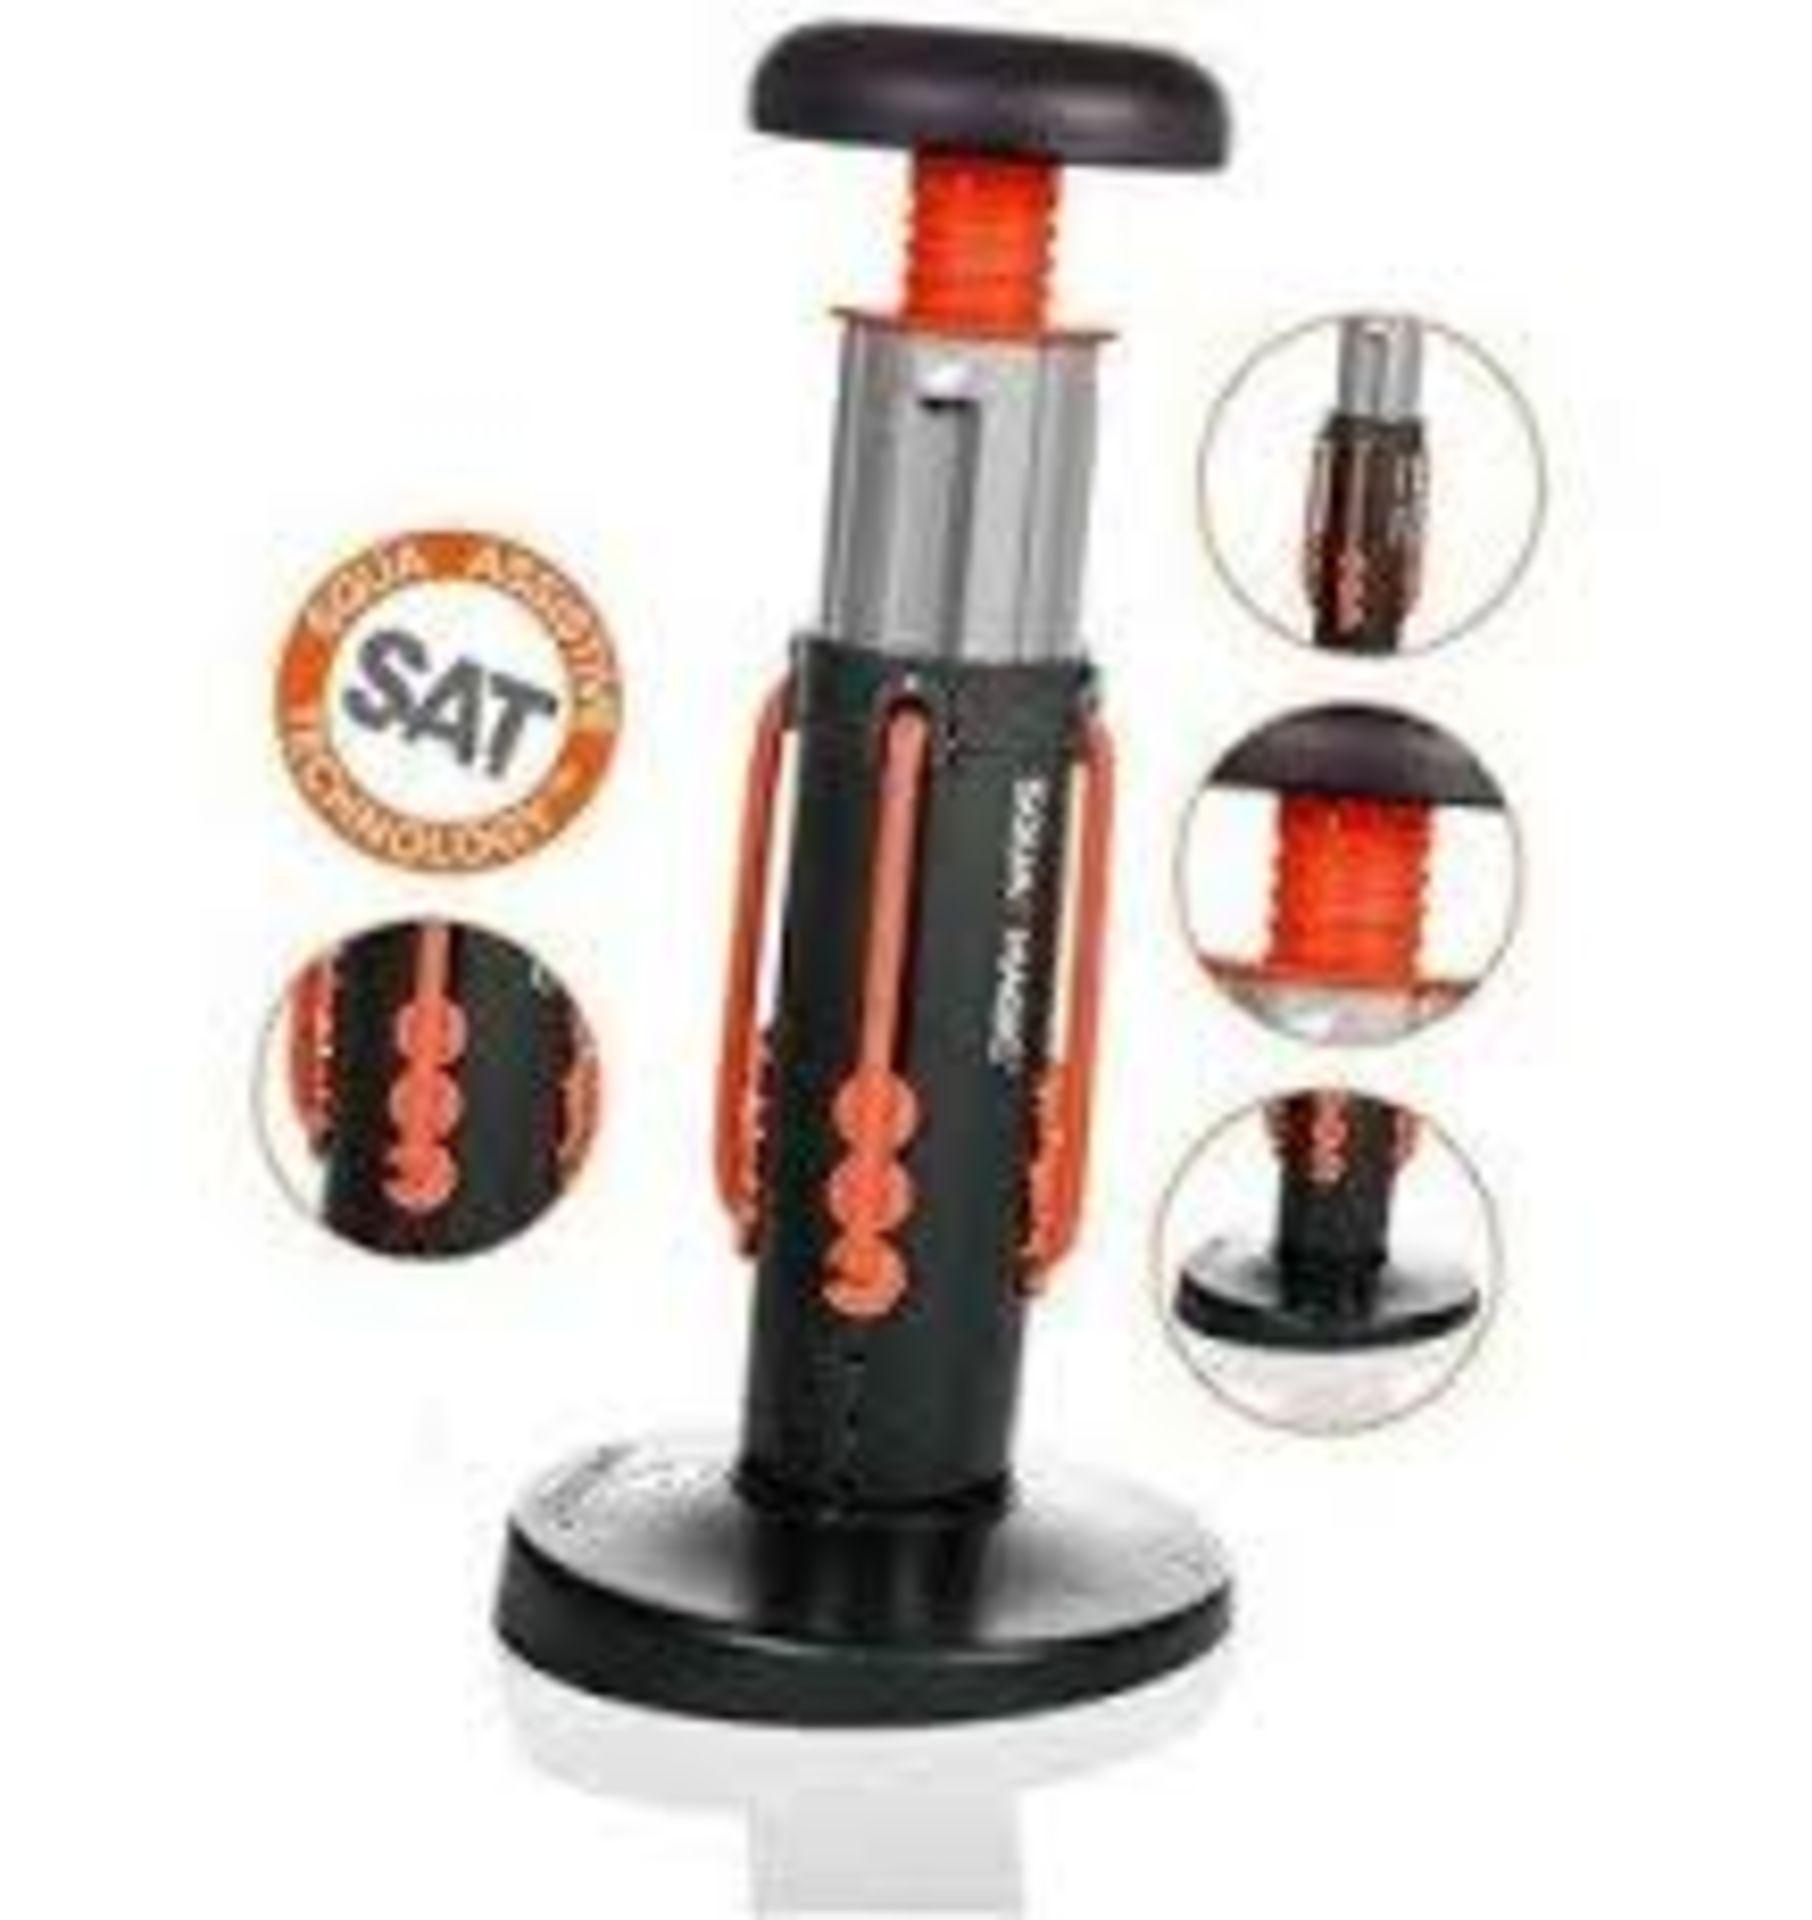 Brand New - New Image Squat Magic Exerciser Rrp 69.99